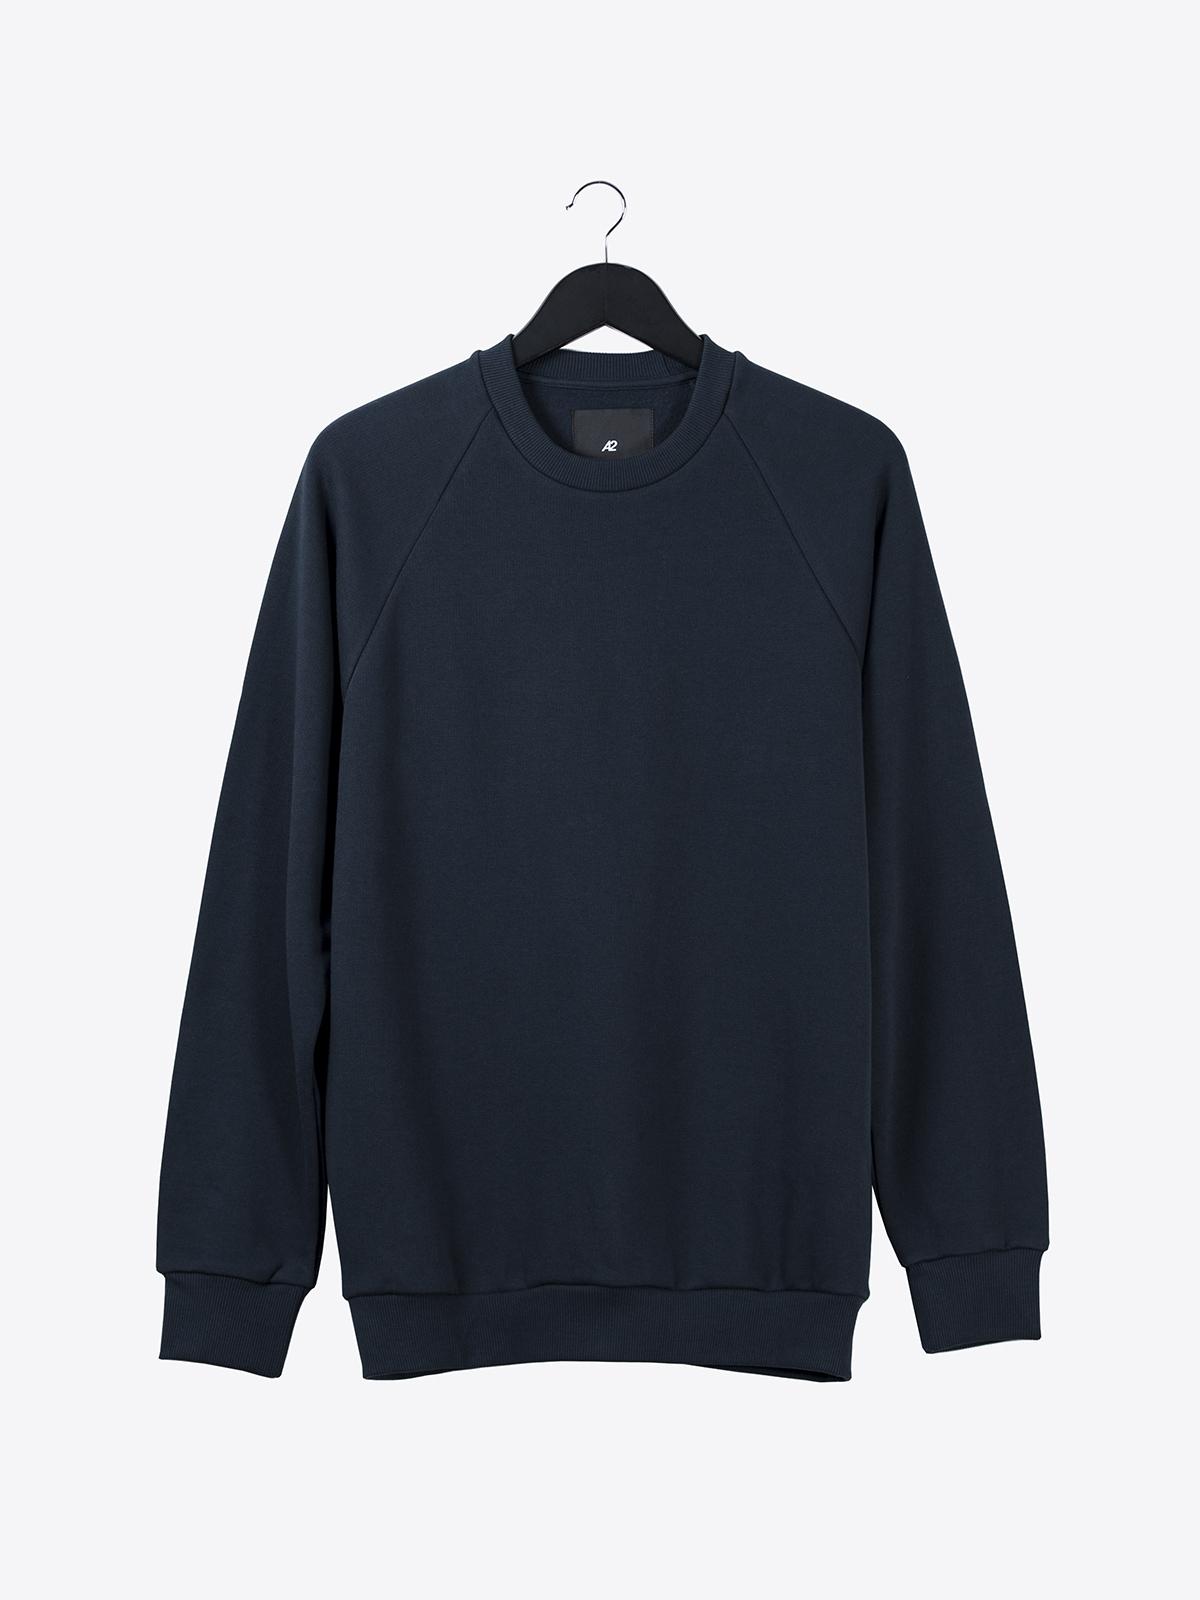 A2 basic raglan sweatshirt | dark navy